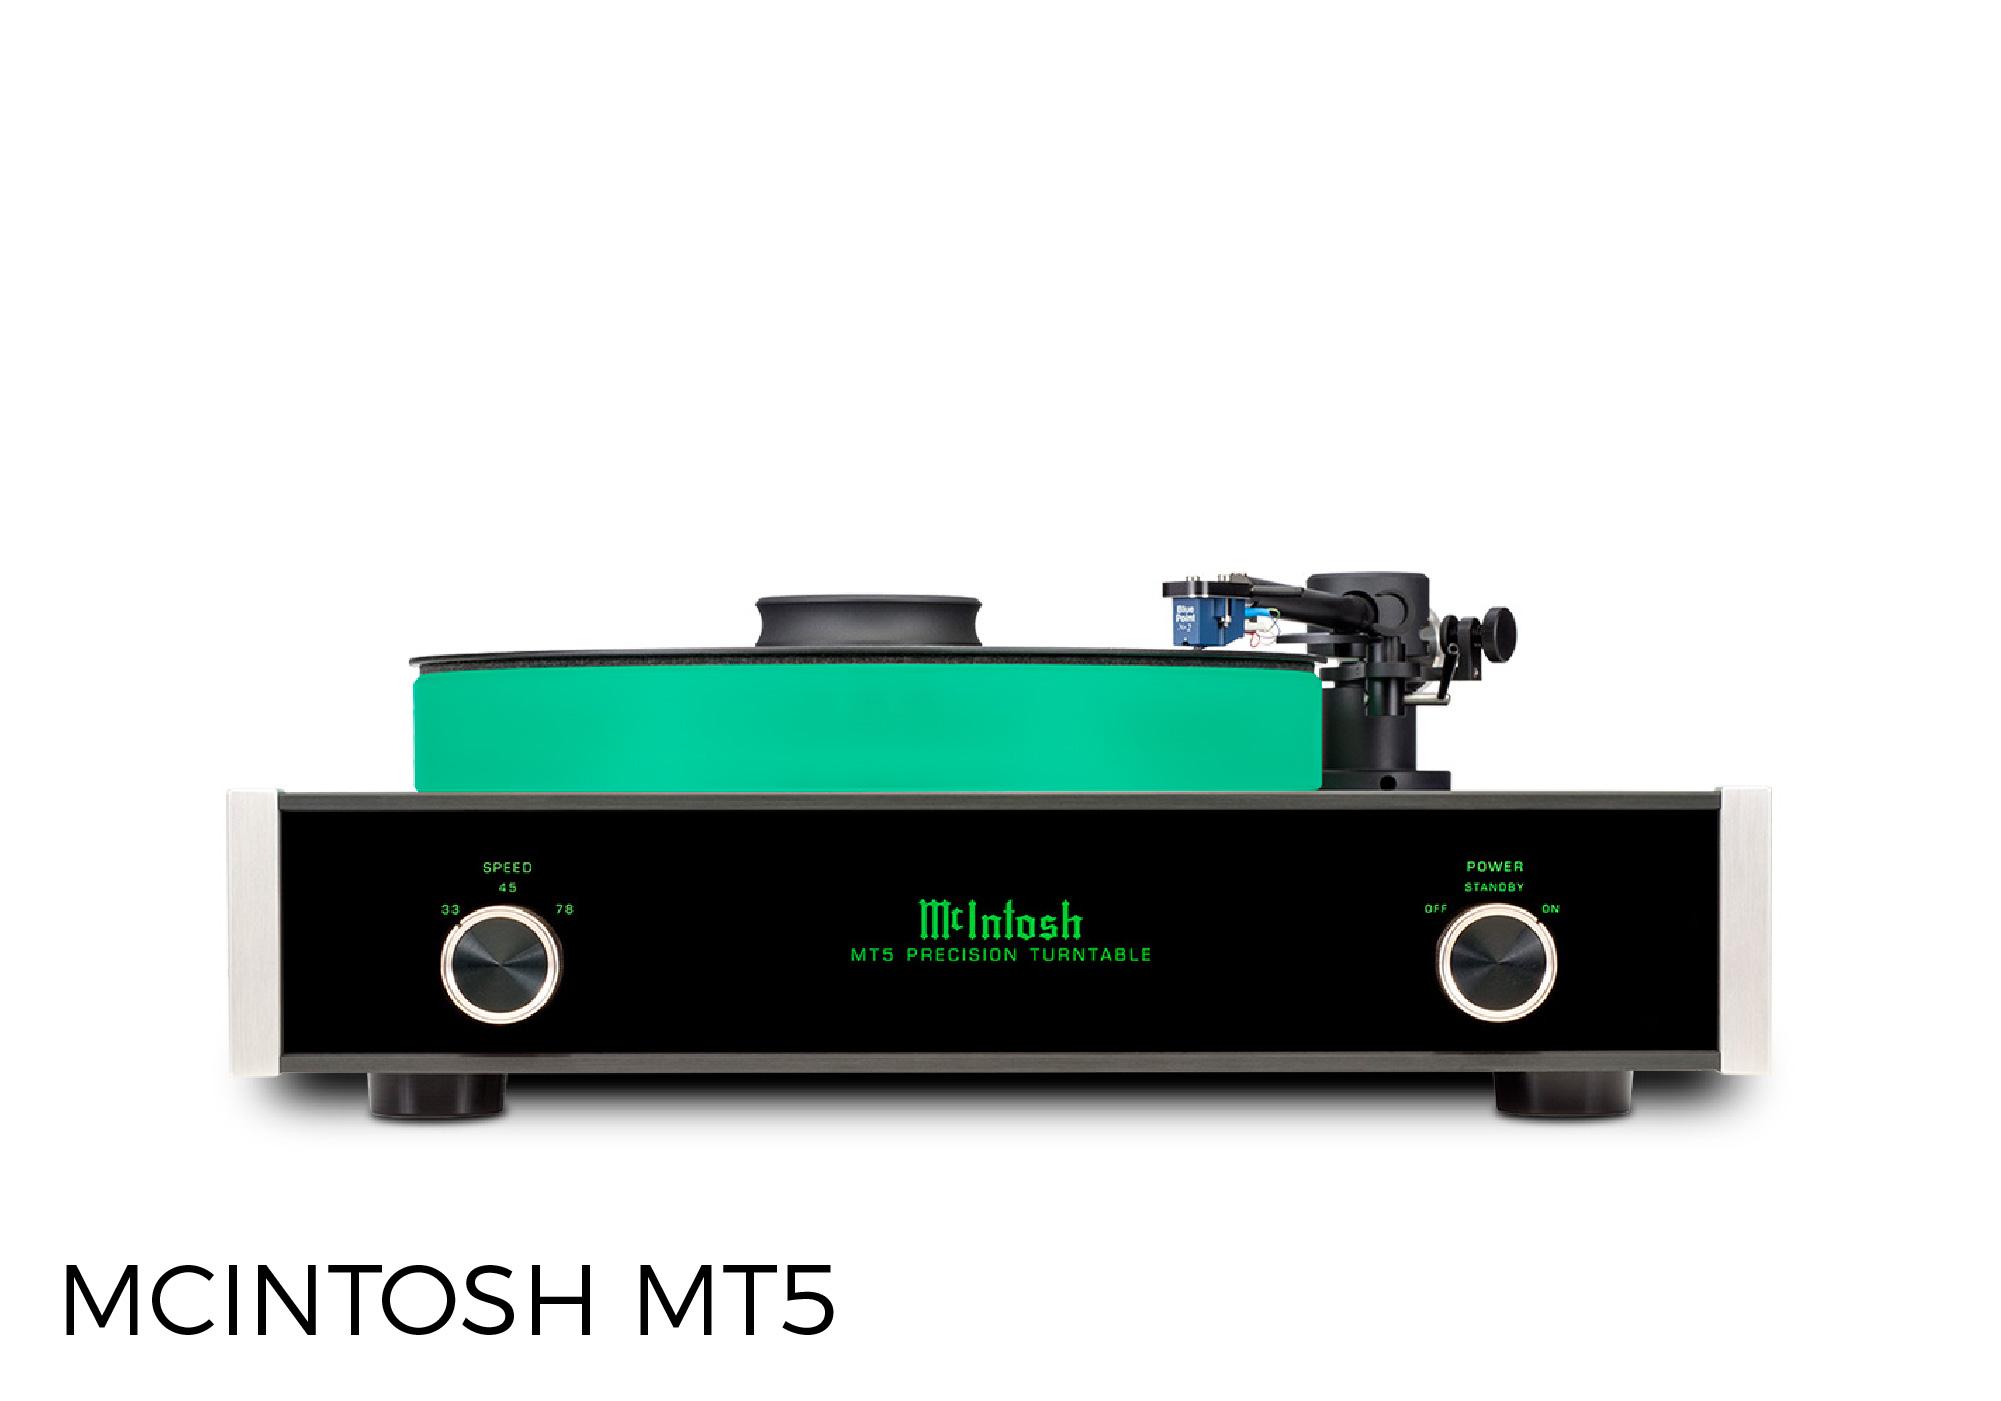 McIntosh MT5 dong thanh hoa phuc